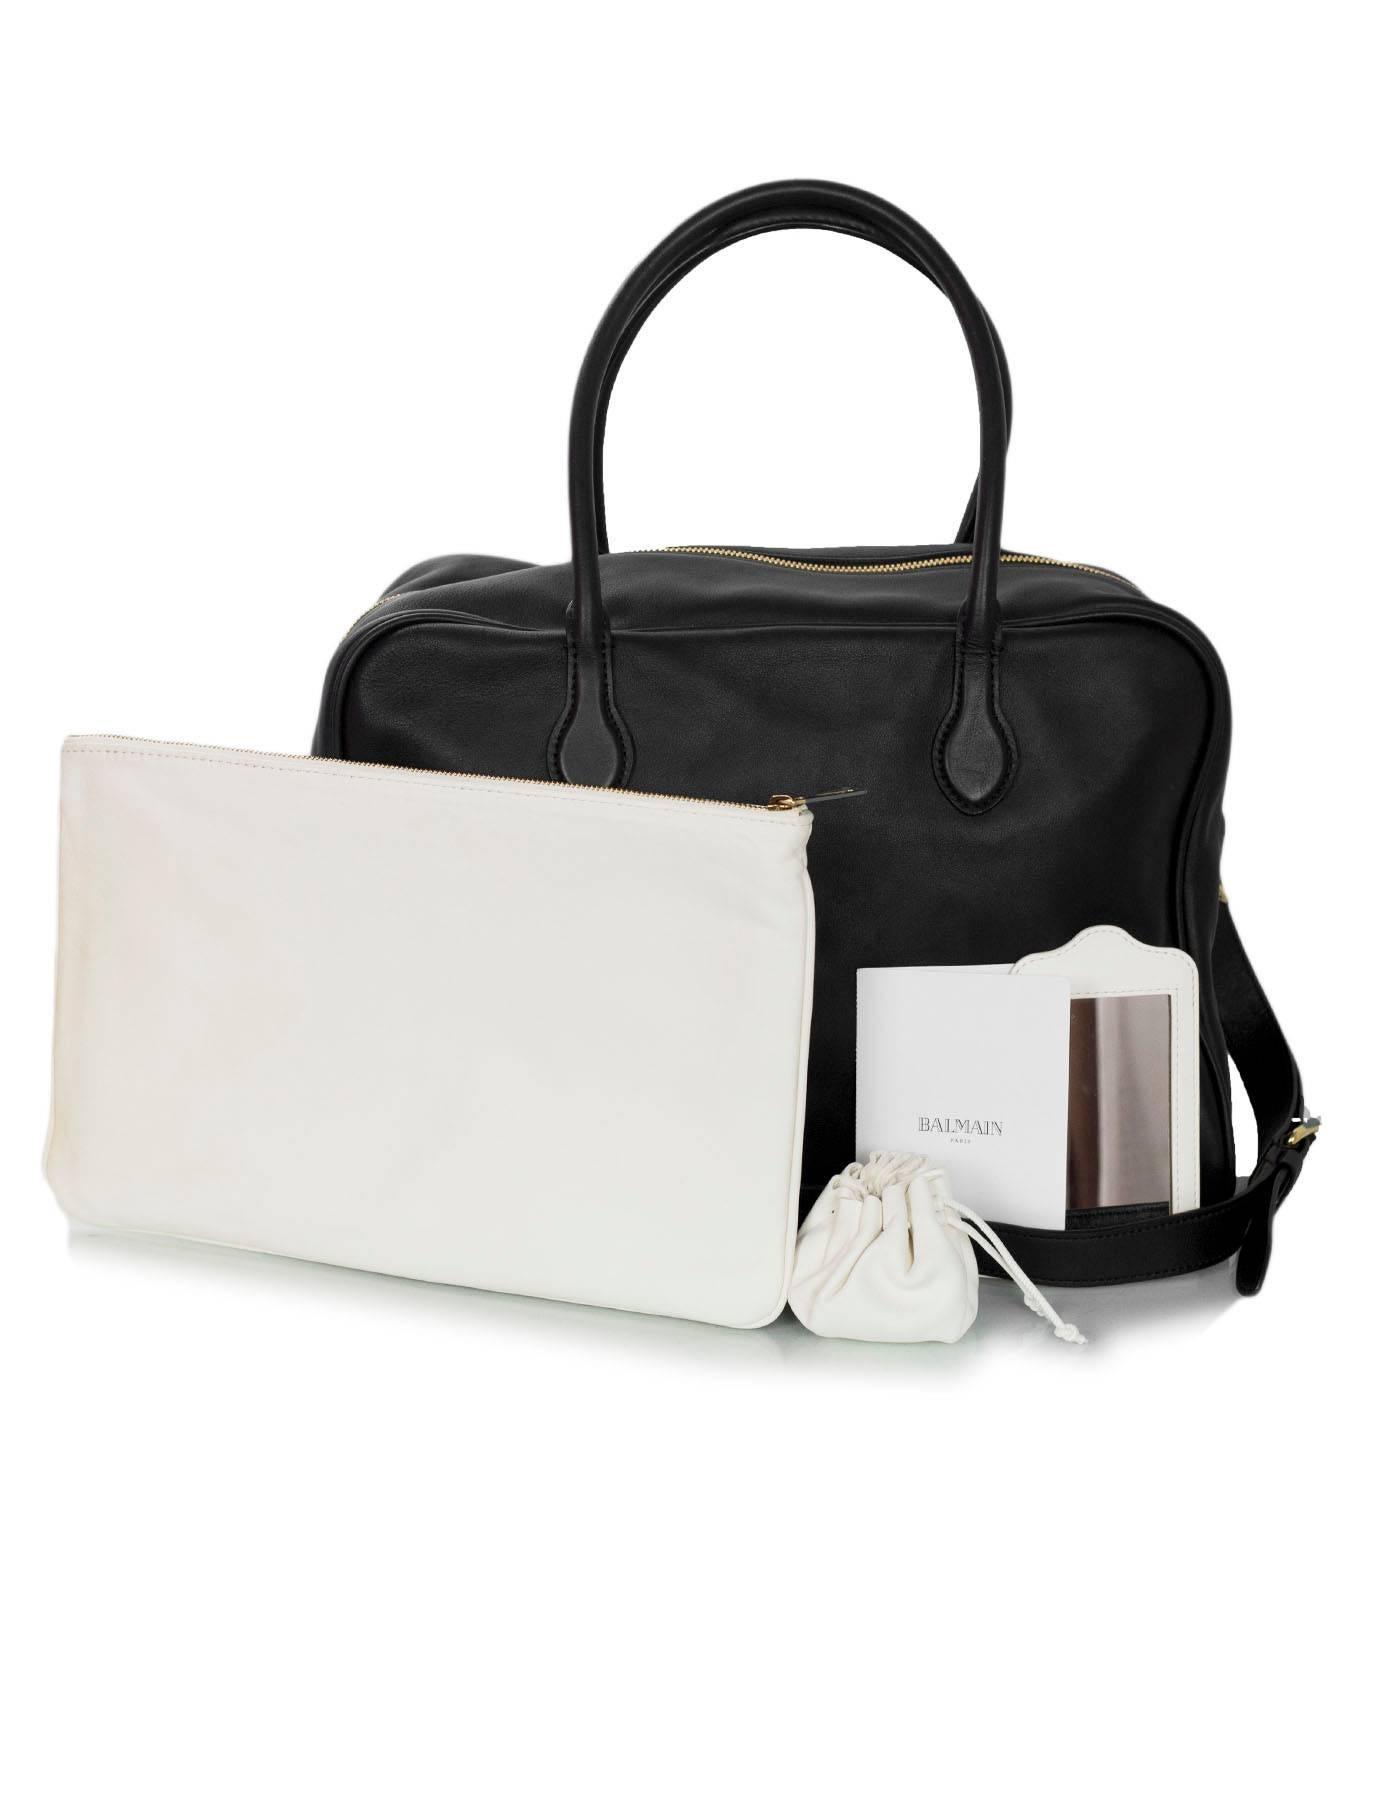 Balmain Black Leather Pierre Satchel Bag With Strap BshP0